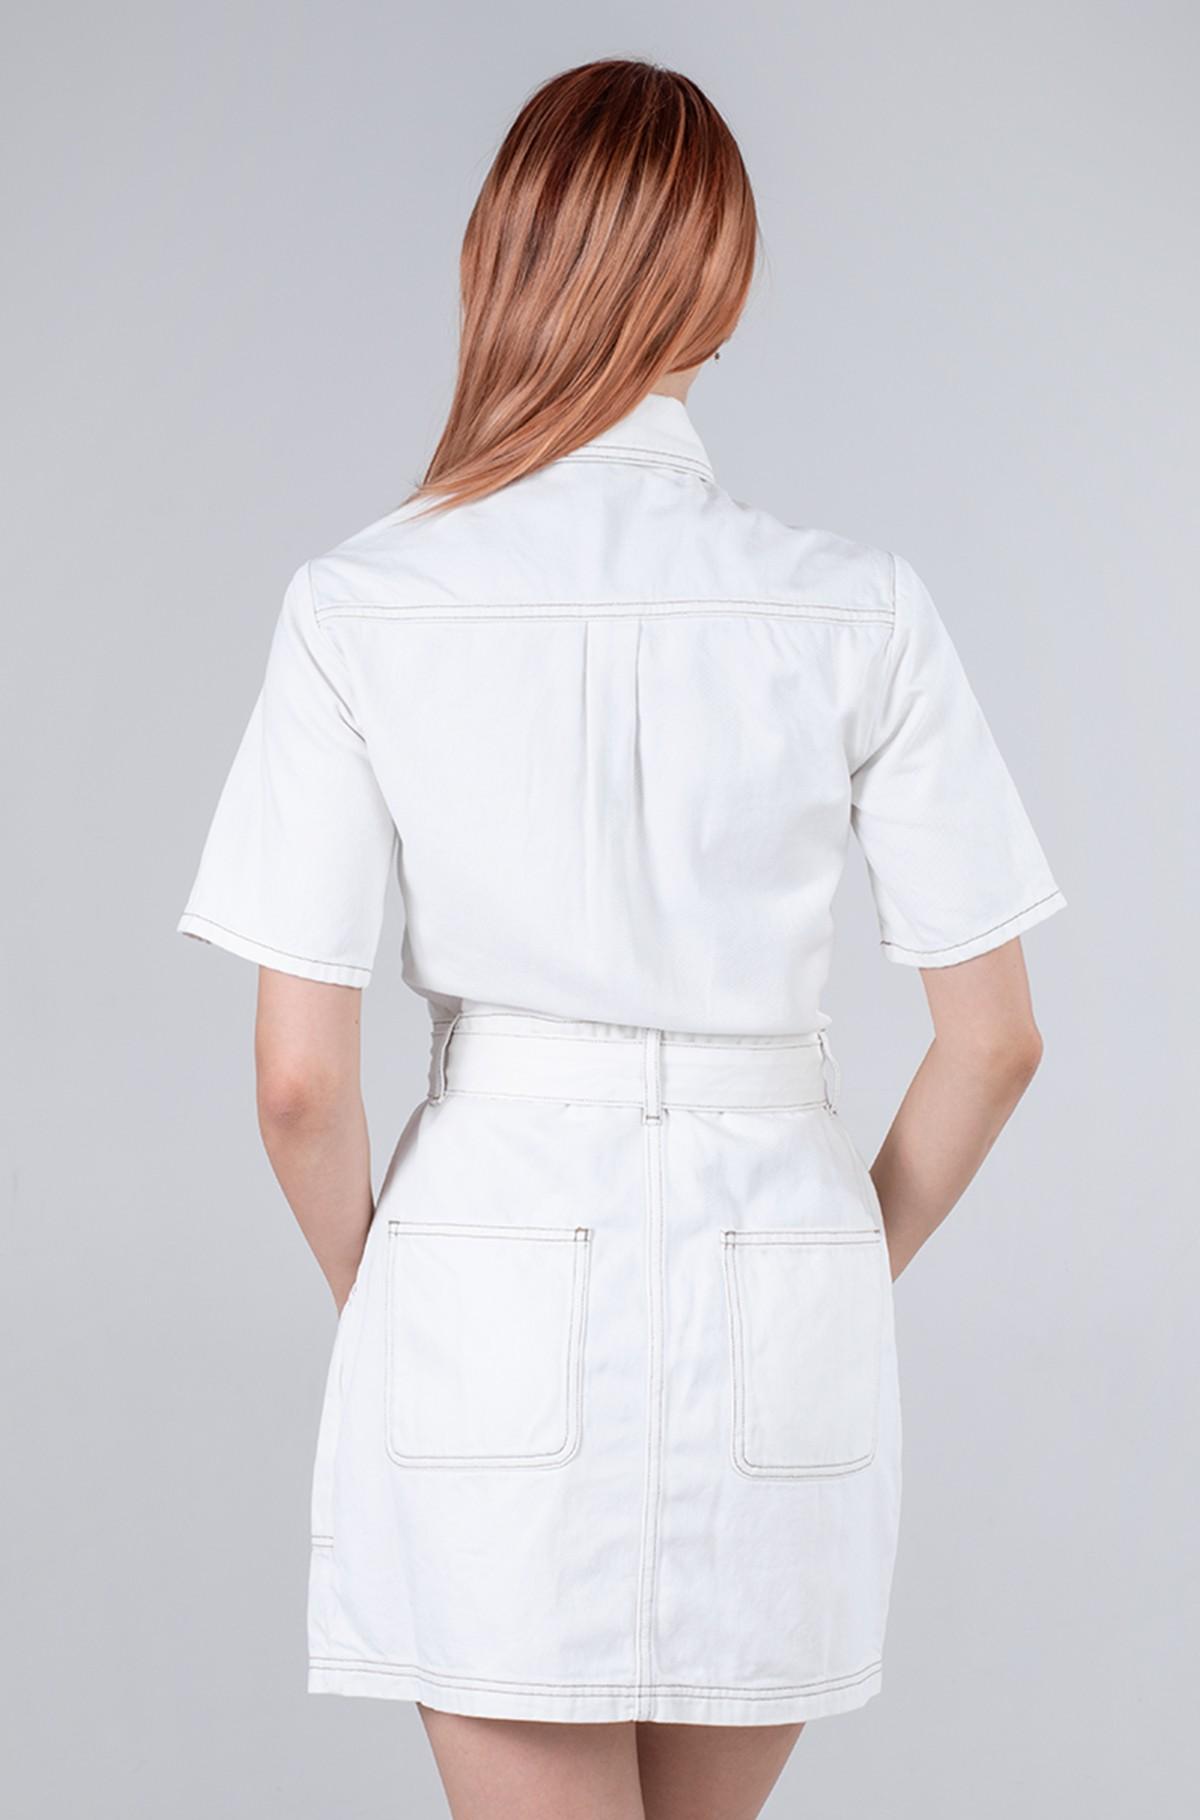 Teksakleit UTILITY TWILL DRESS AE795 SWR-full-2